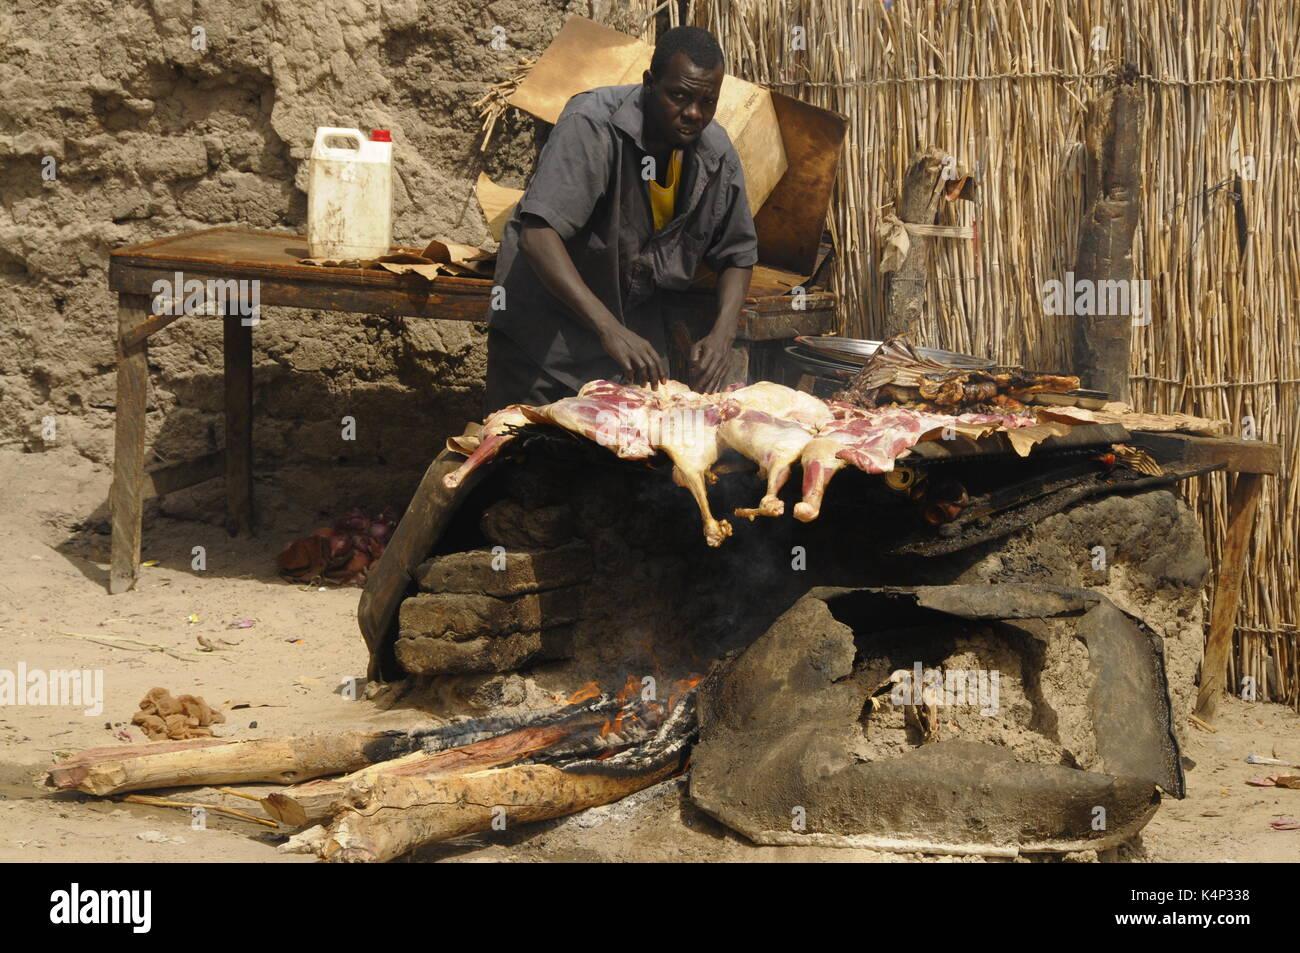 man frying lamb on a street of faya chad africa stock photo